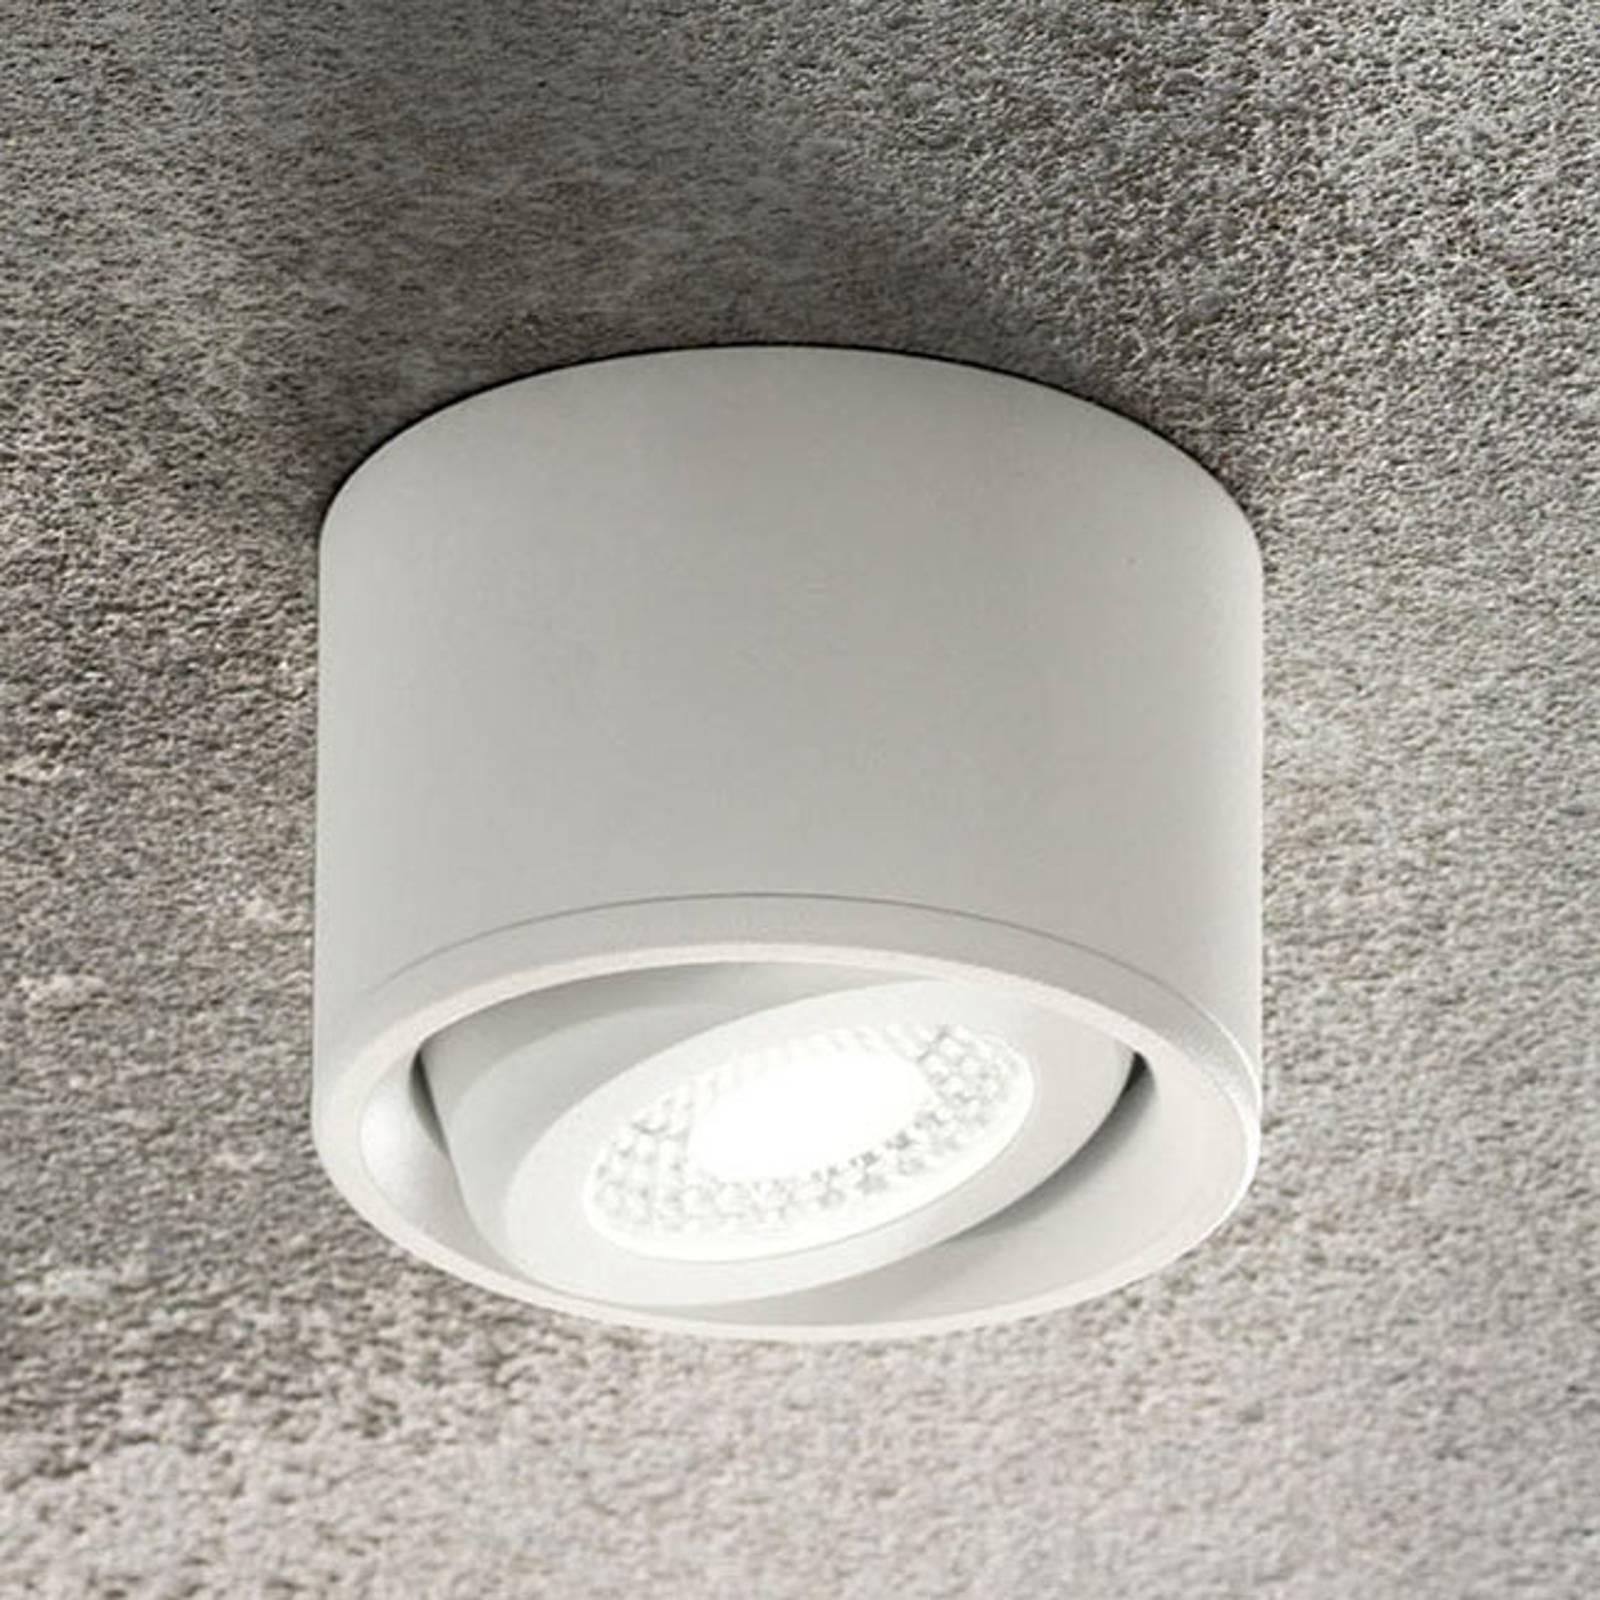 Kantelbare kop - LED downlight Anzio, wit